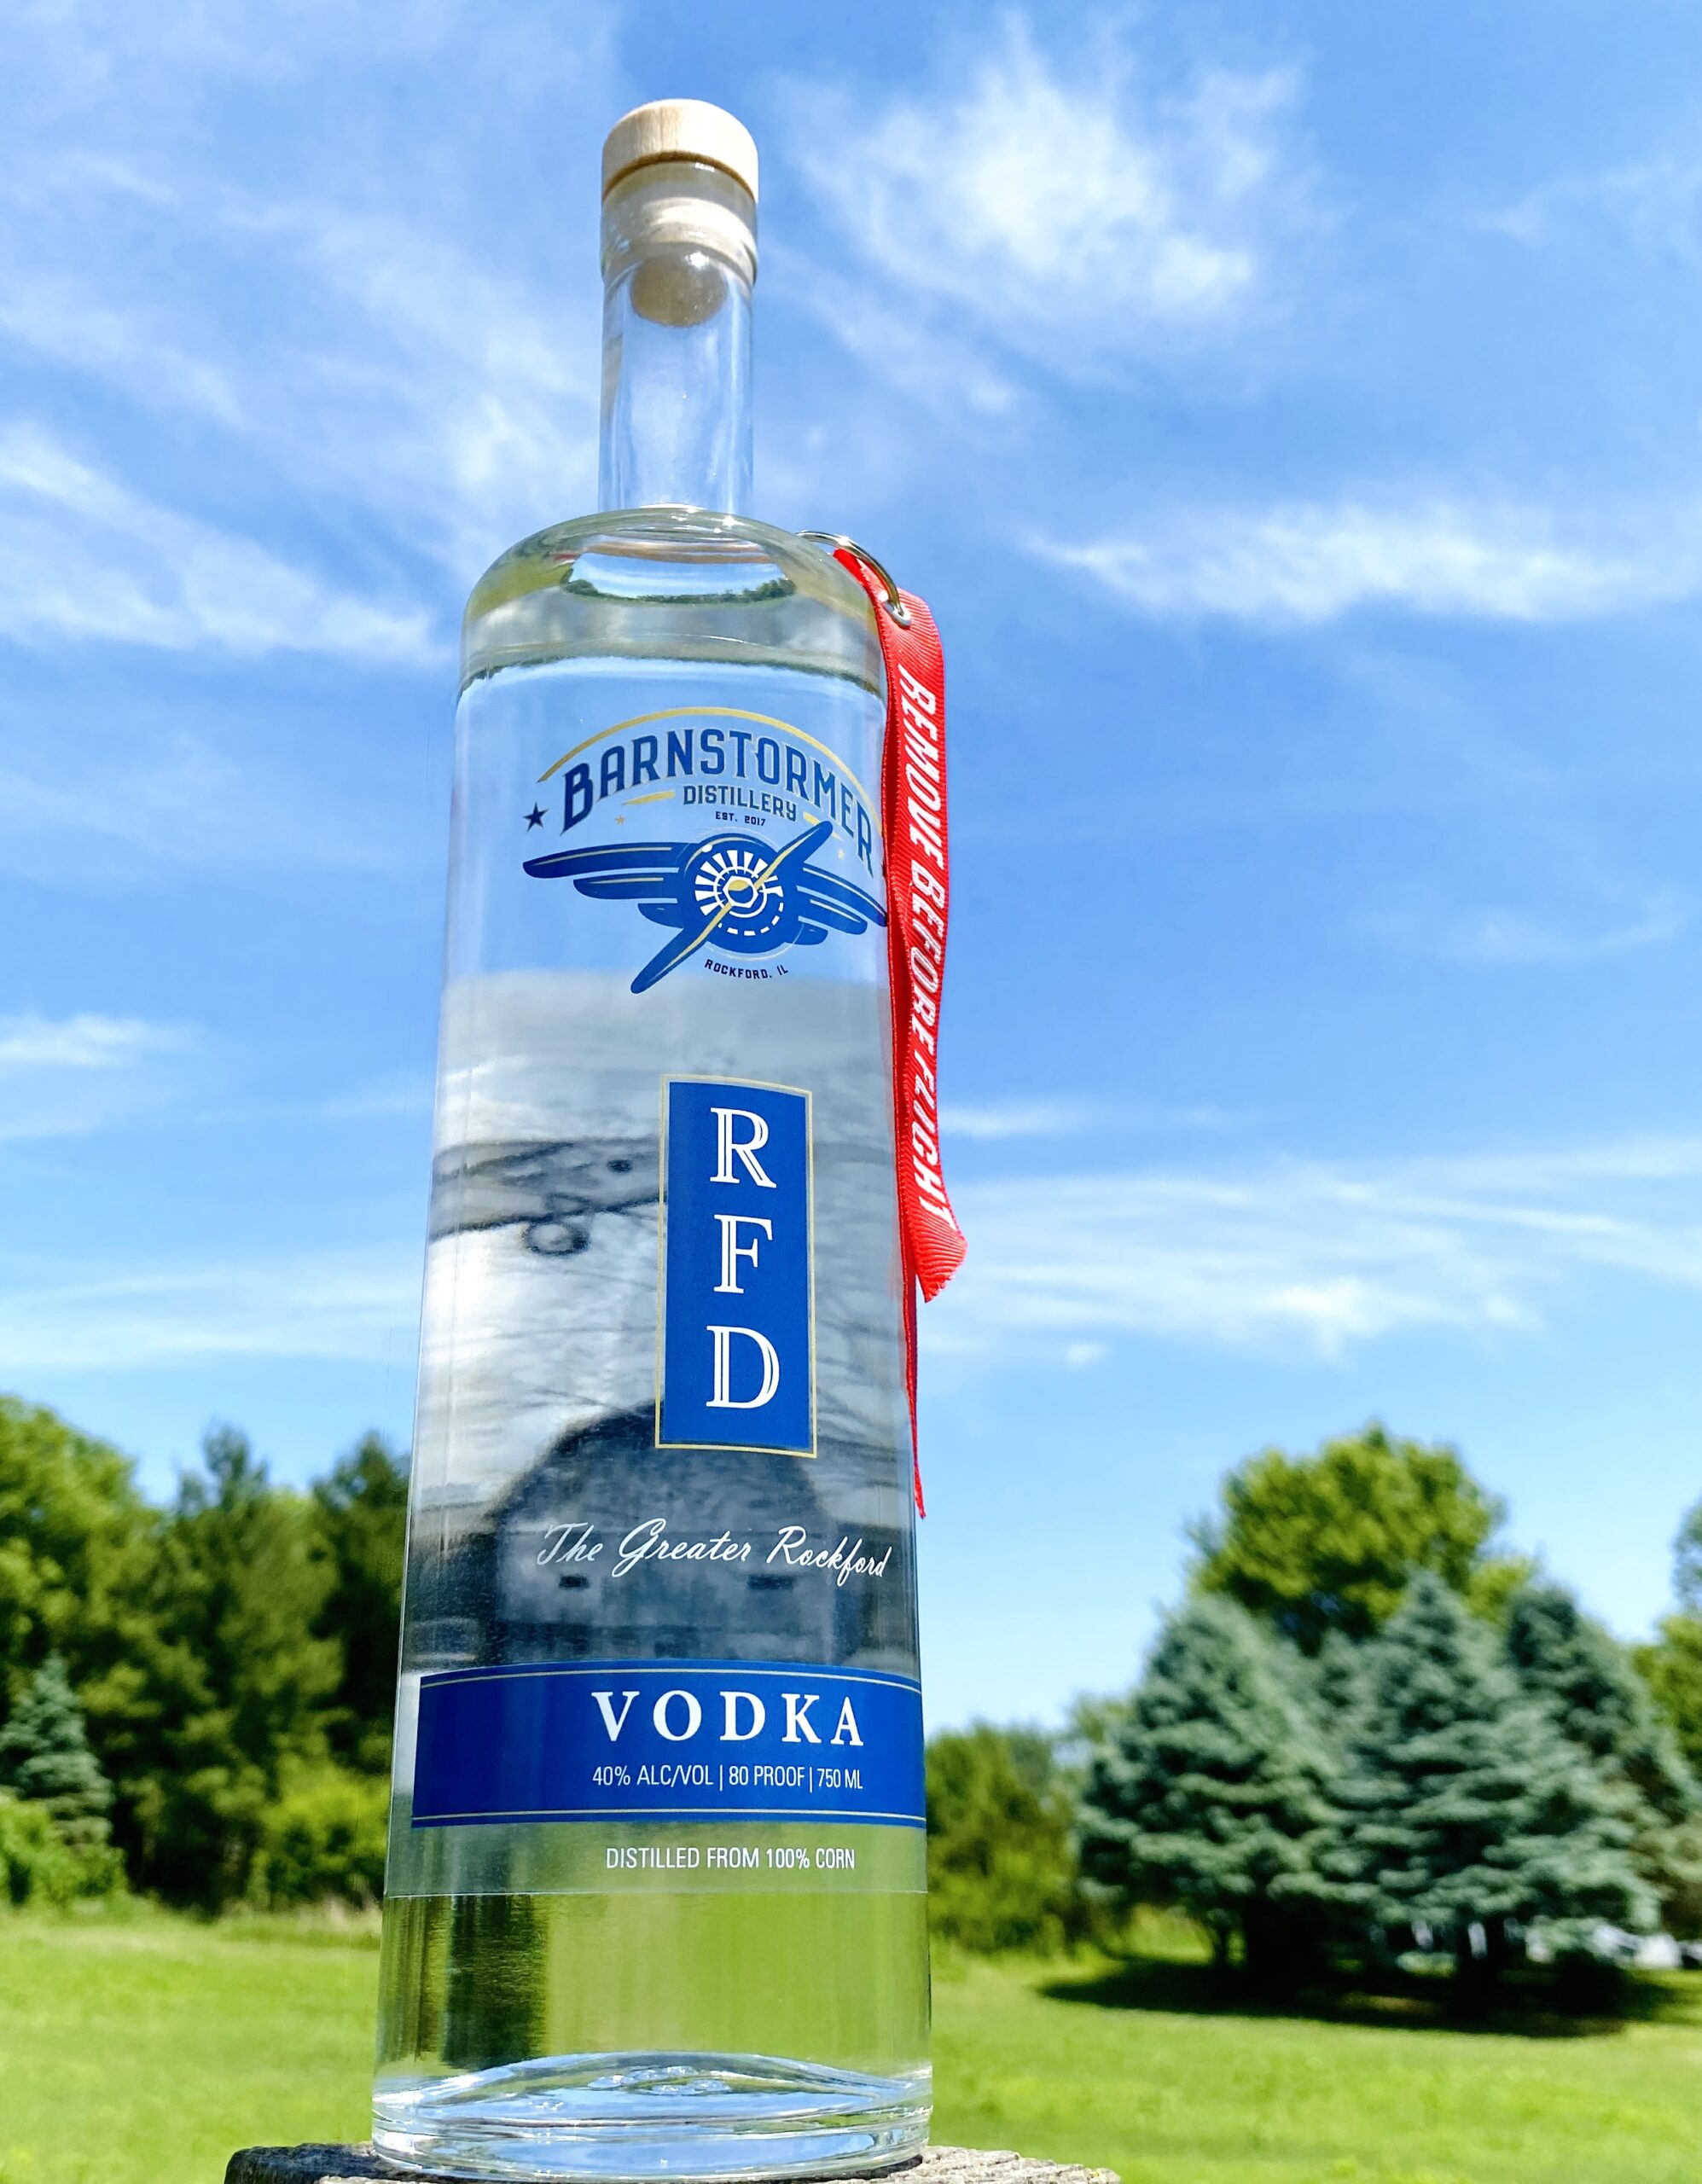 Barnstormer's RFD Vodka